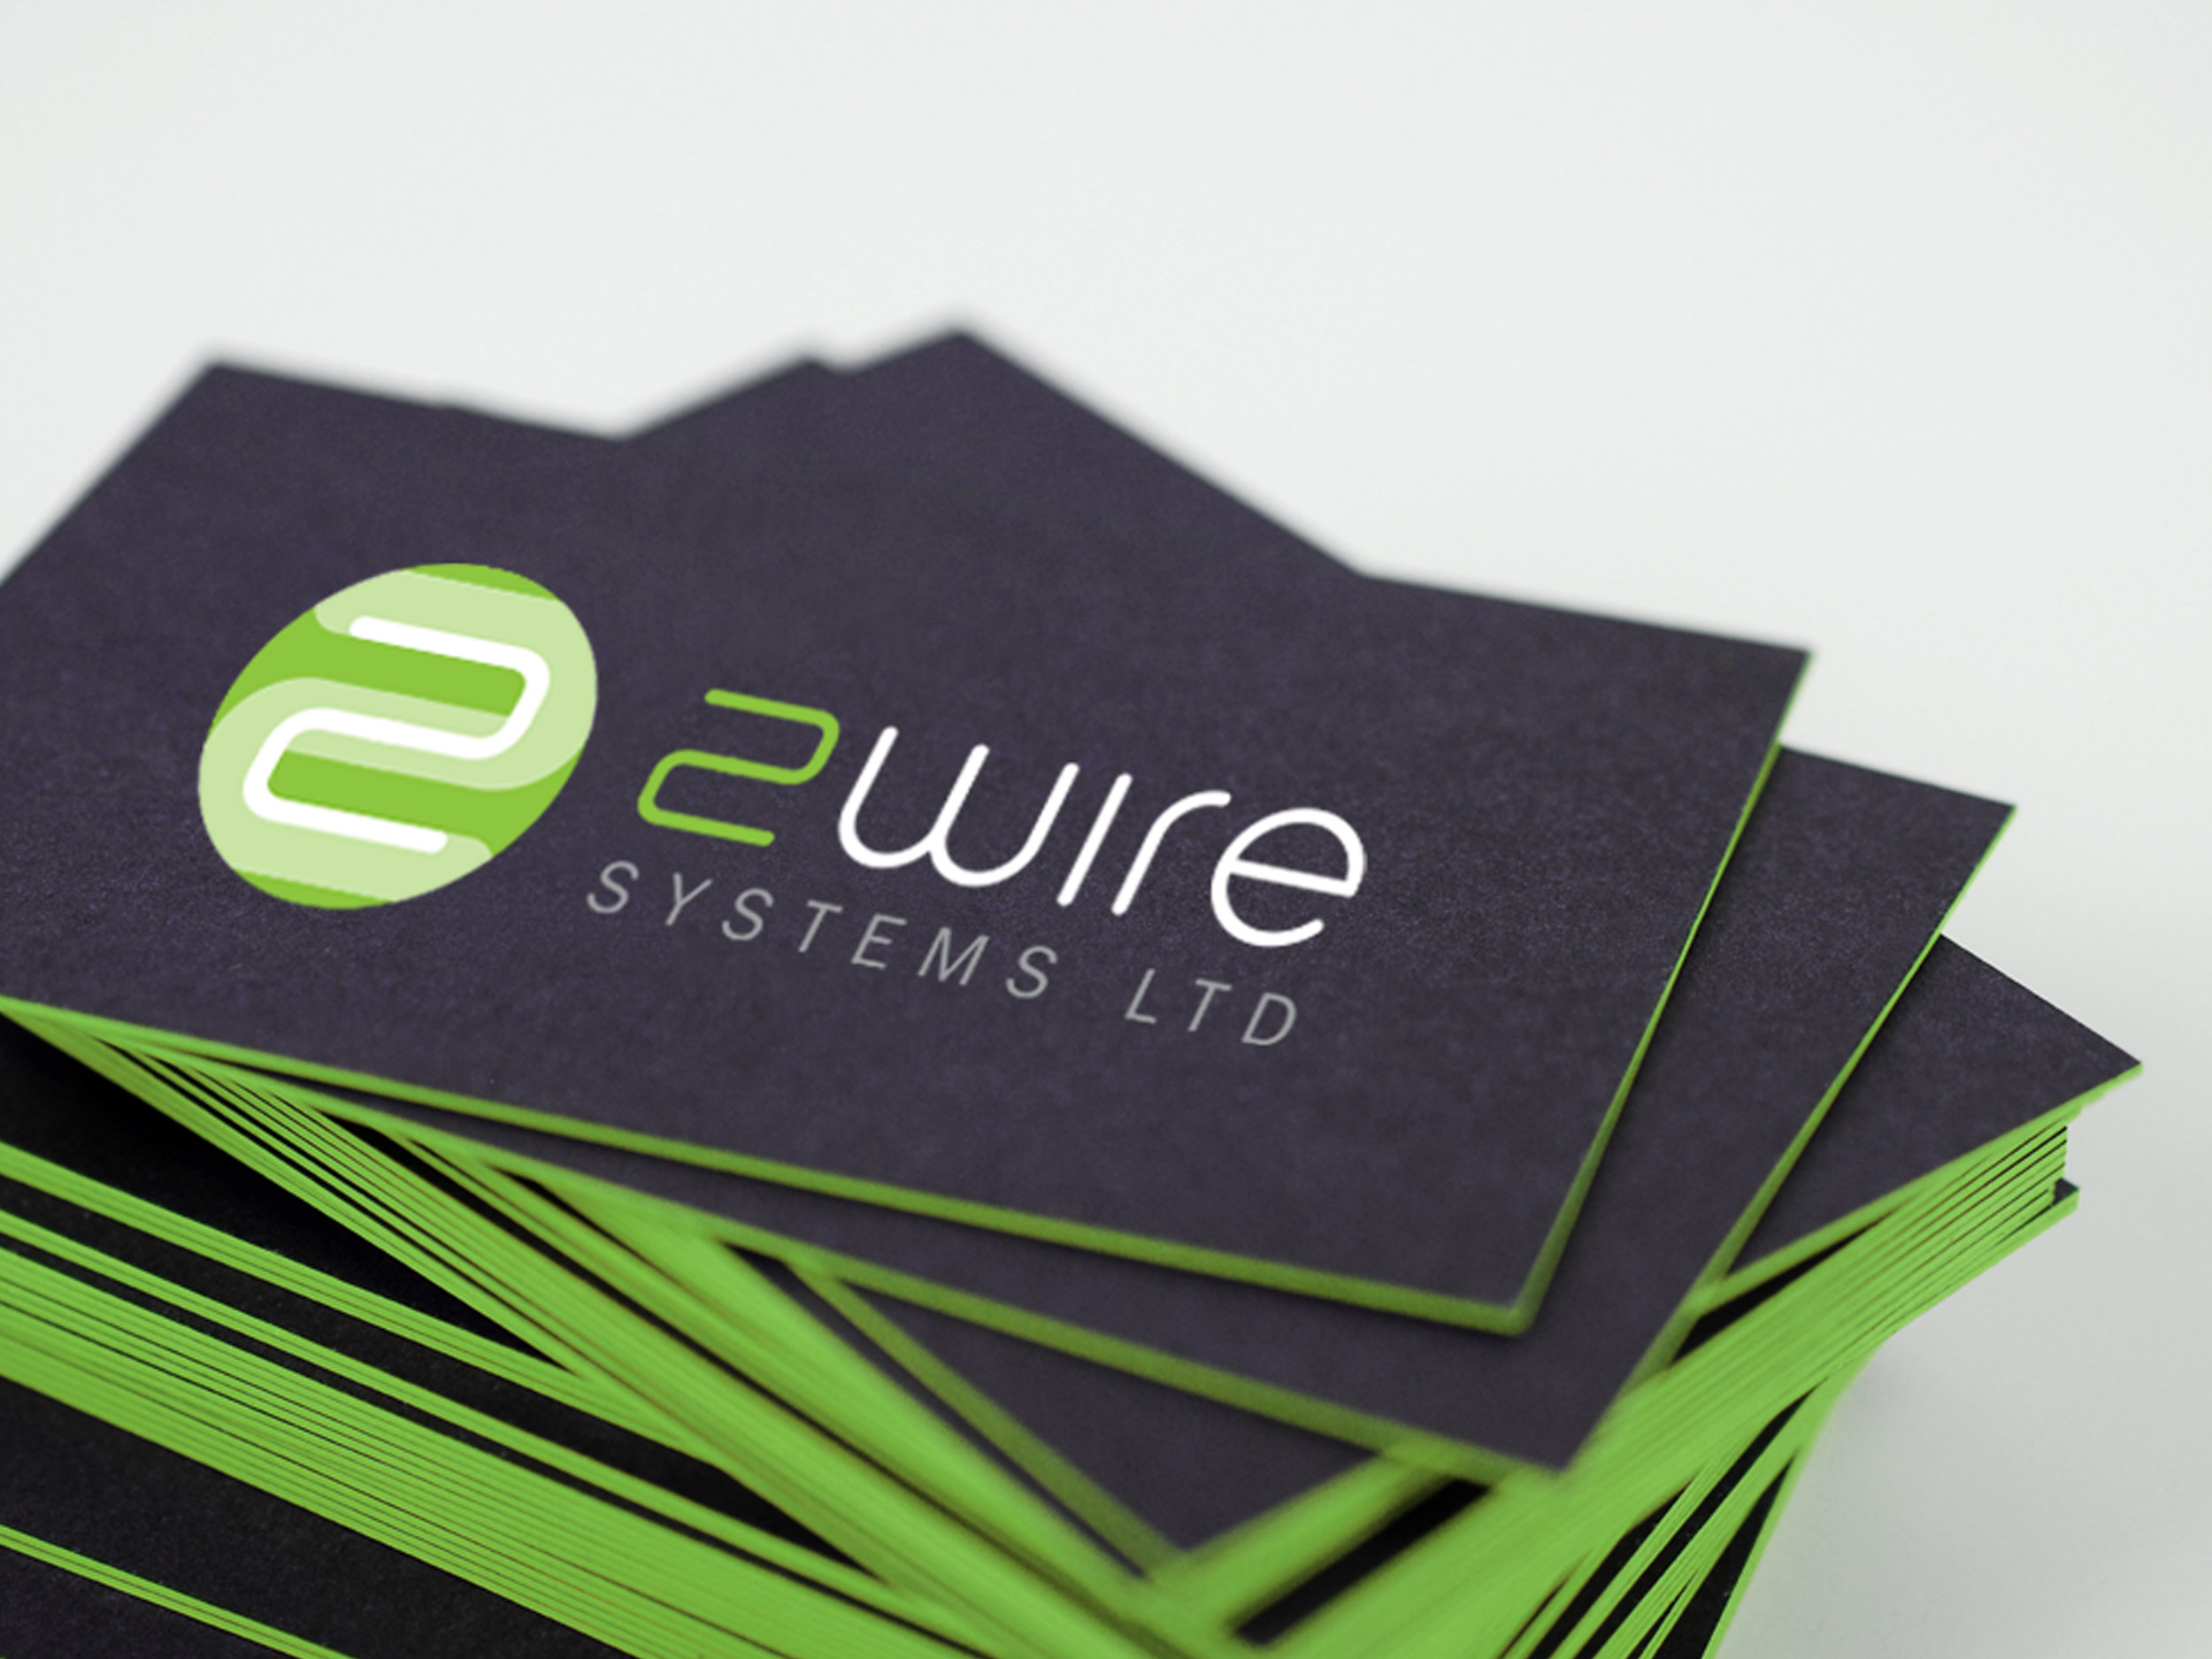 2 Wire_business card.JPG